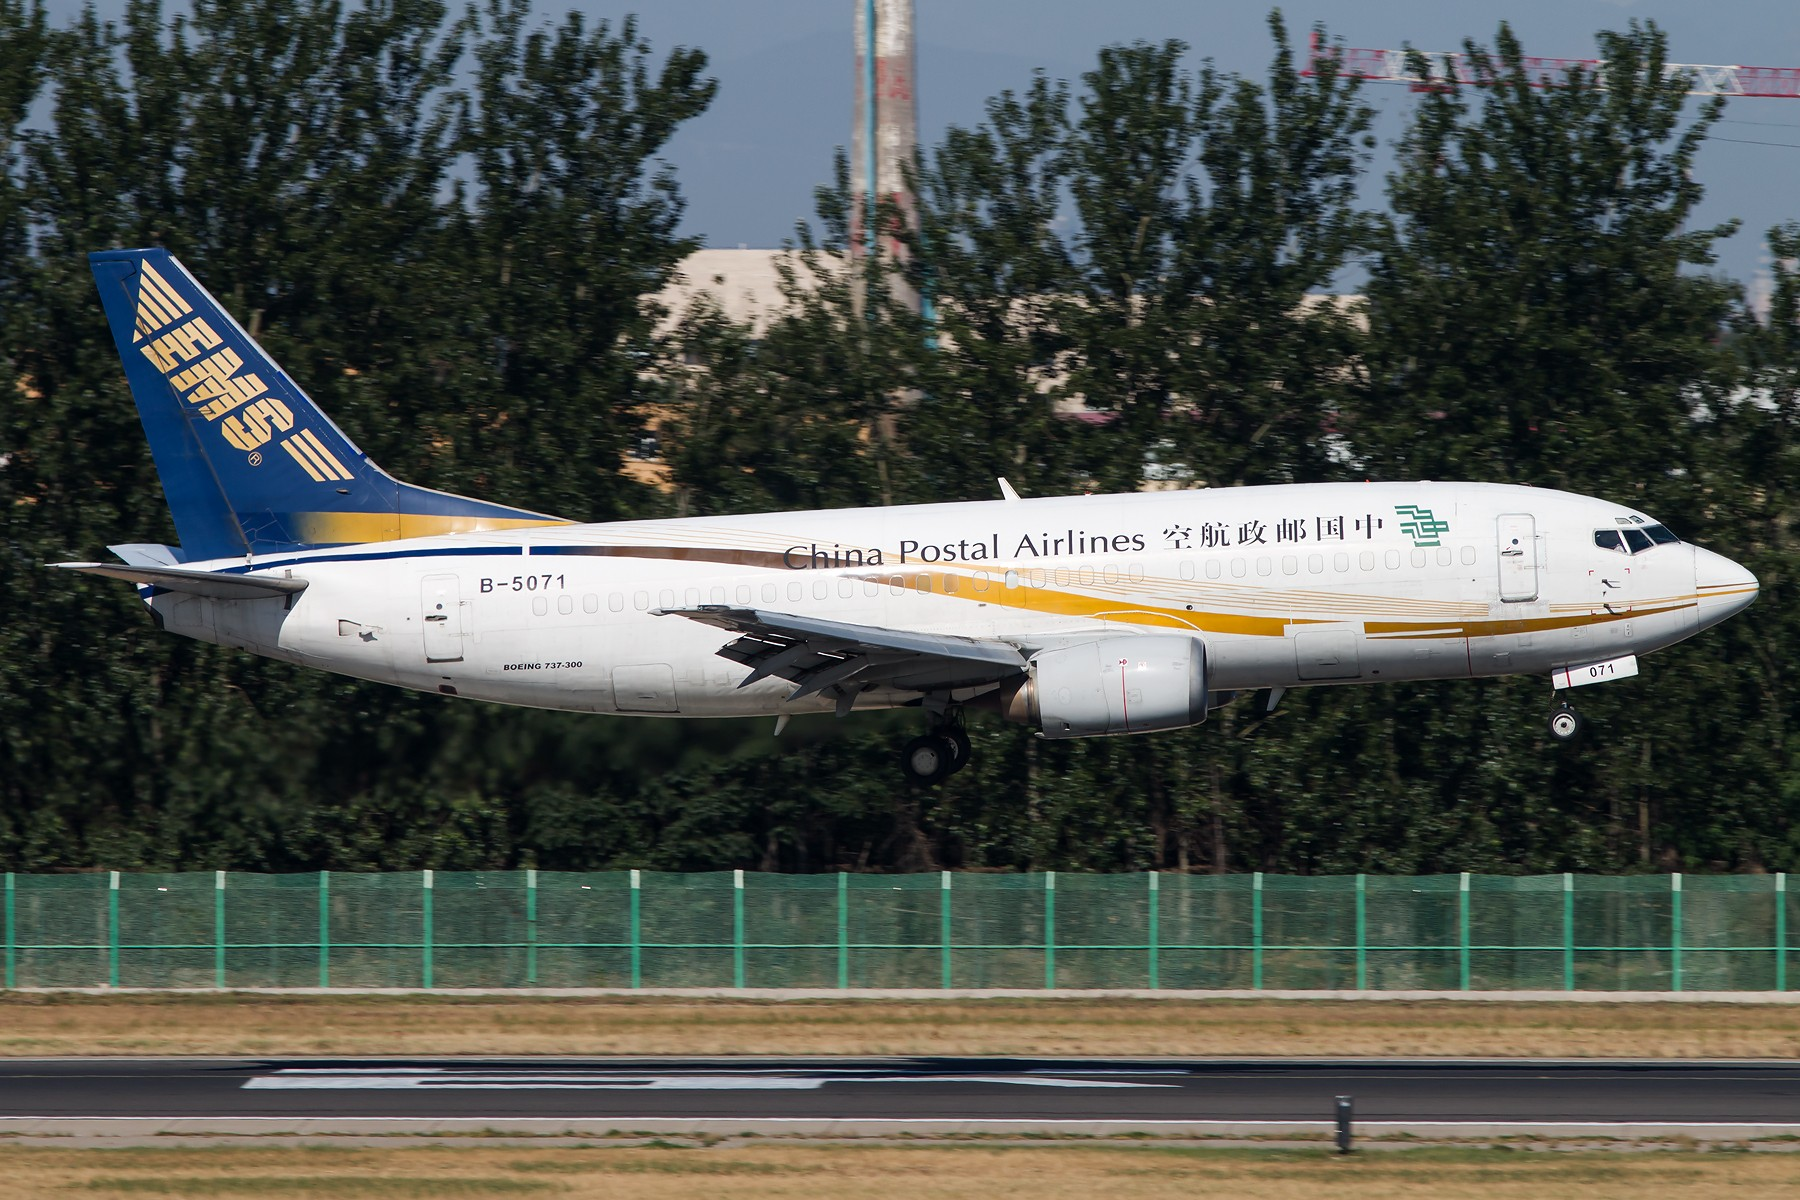 Re:[原创]周末晨练10张 1800*1200 BOEING 737-300 B-5071 中国北京首都国际机场